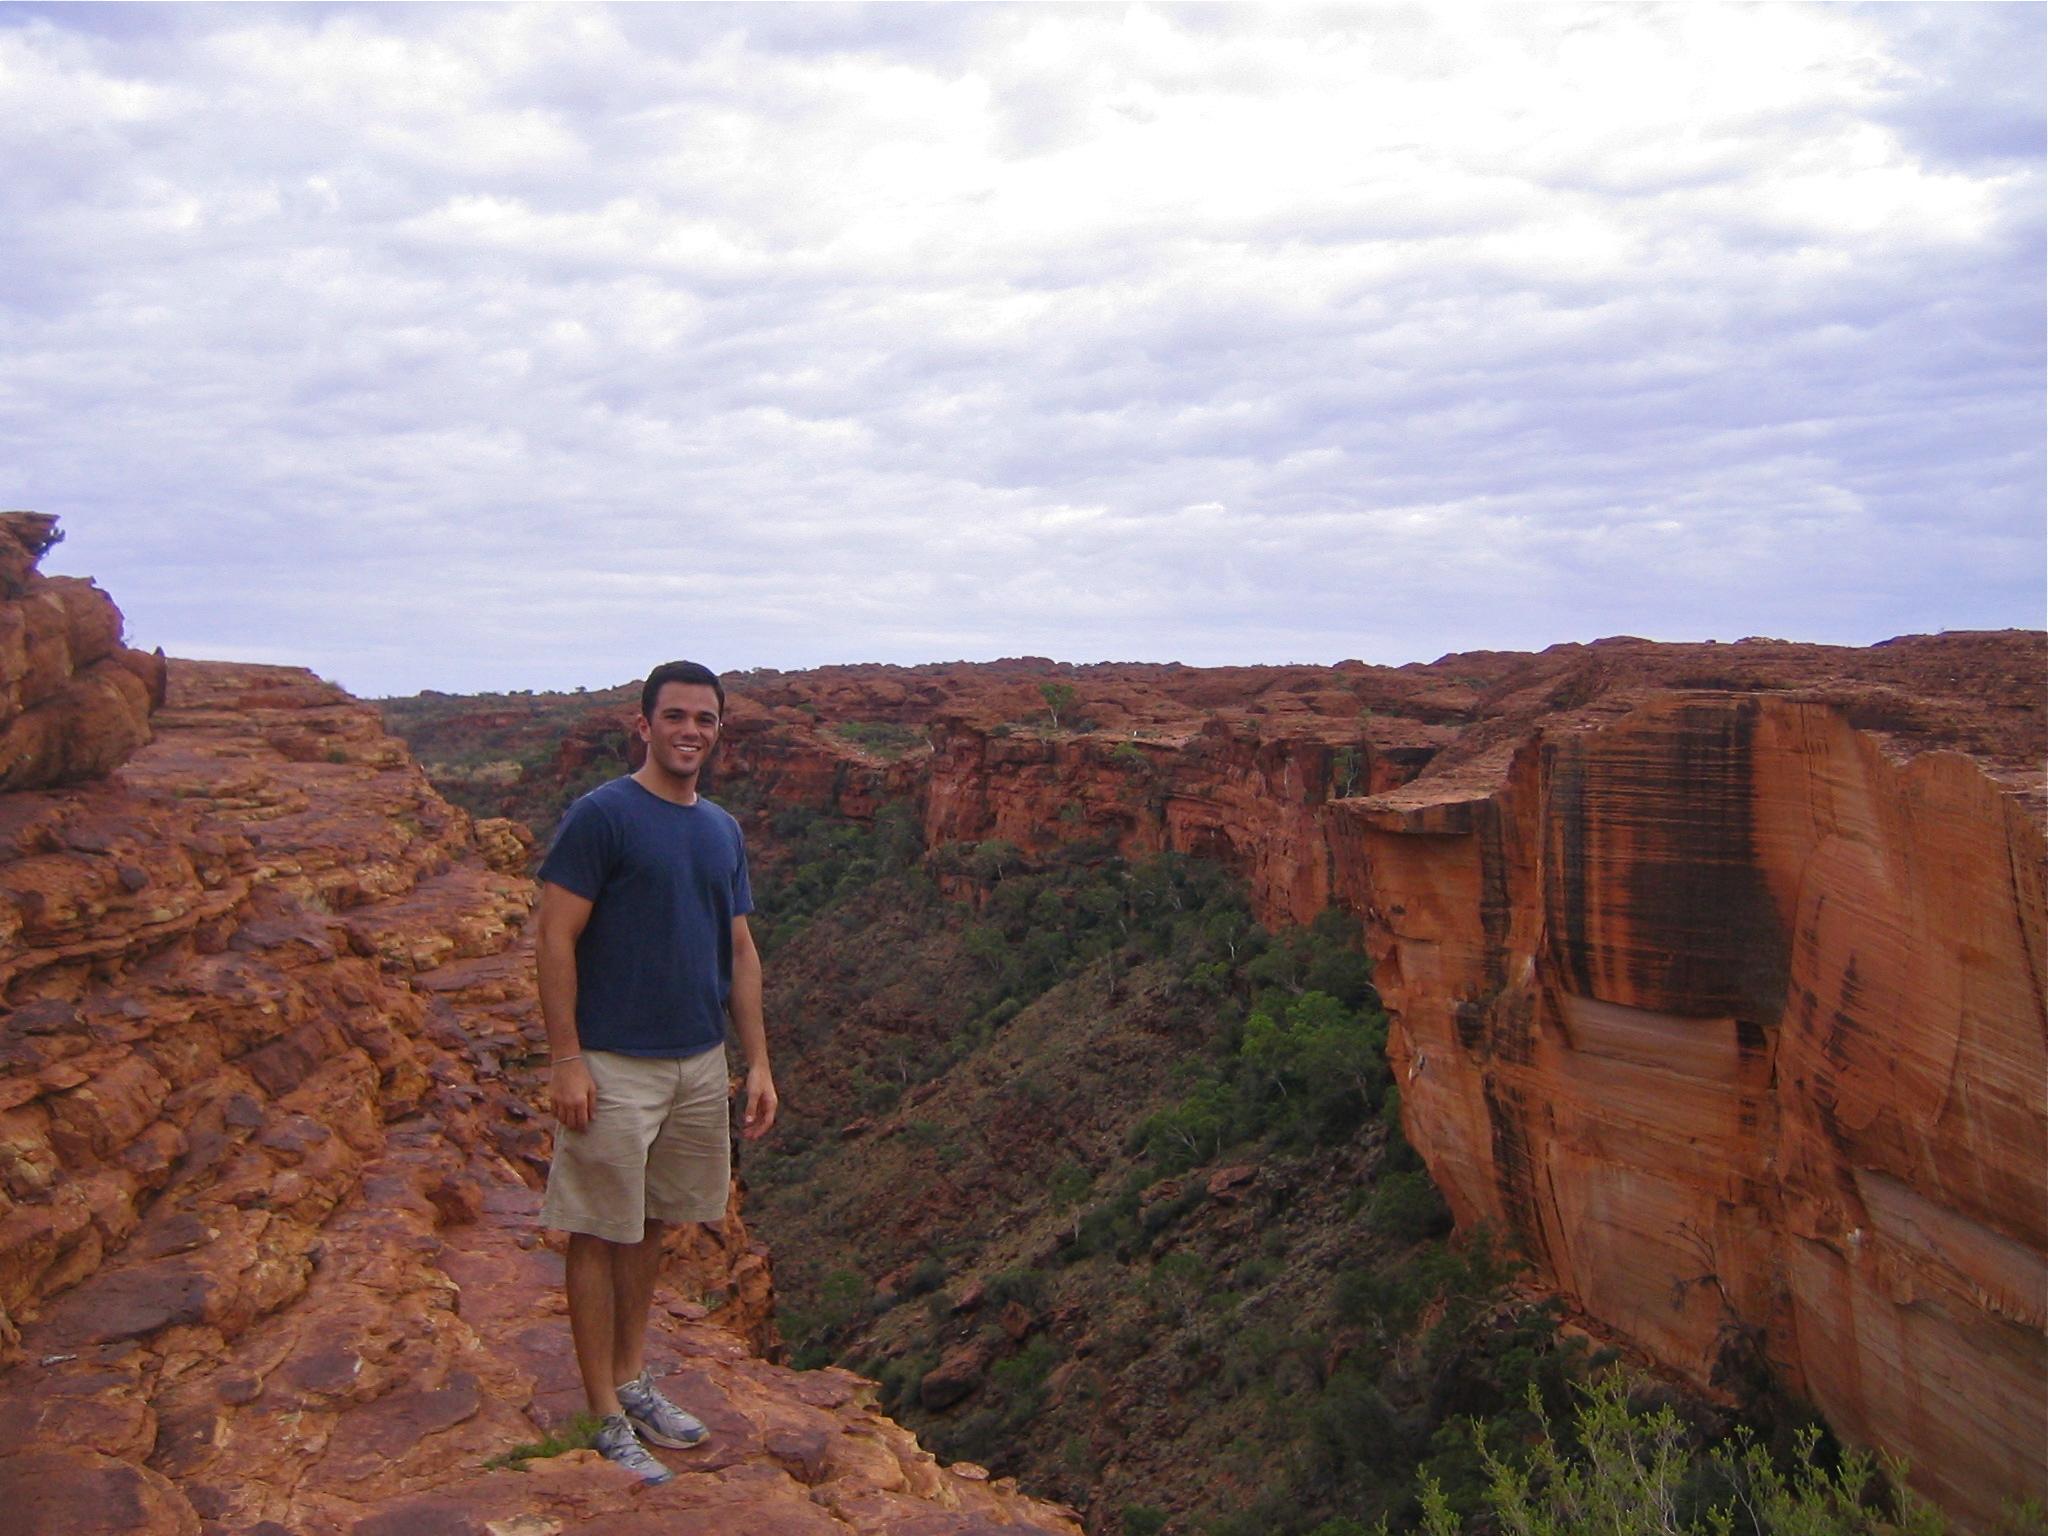 Solo Traveler Australian Outback Down Under Kings Canyon Australia Solo Travel Writer Justin Walter atwjustin.com